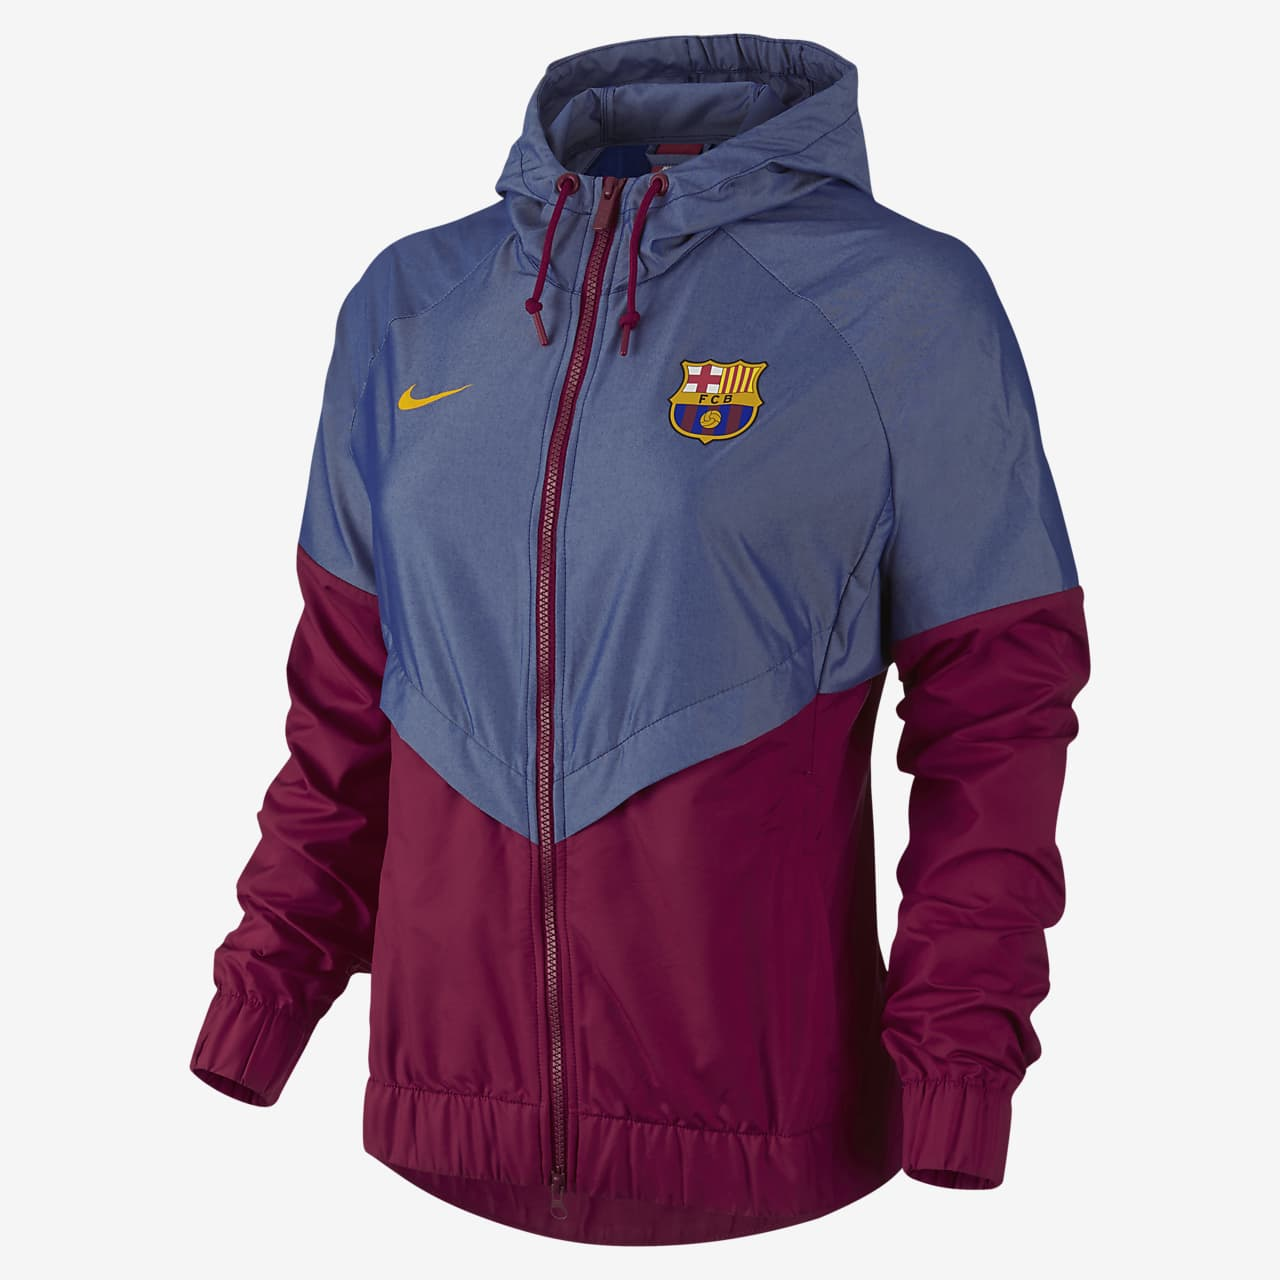 antiguo Ajustarse refrigerador  FC Barcelona Authentic Windrunner Women's Jacket. Nike LU